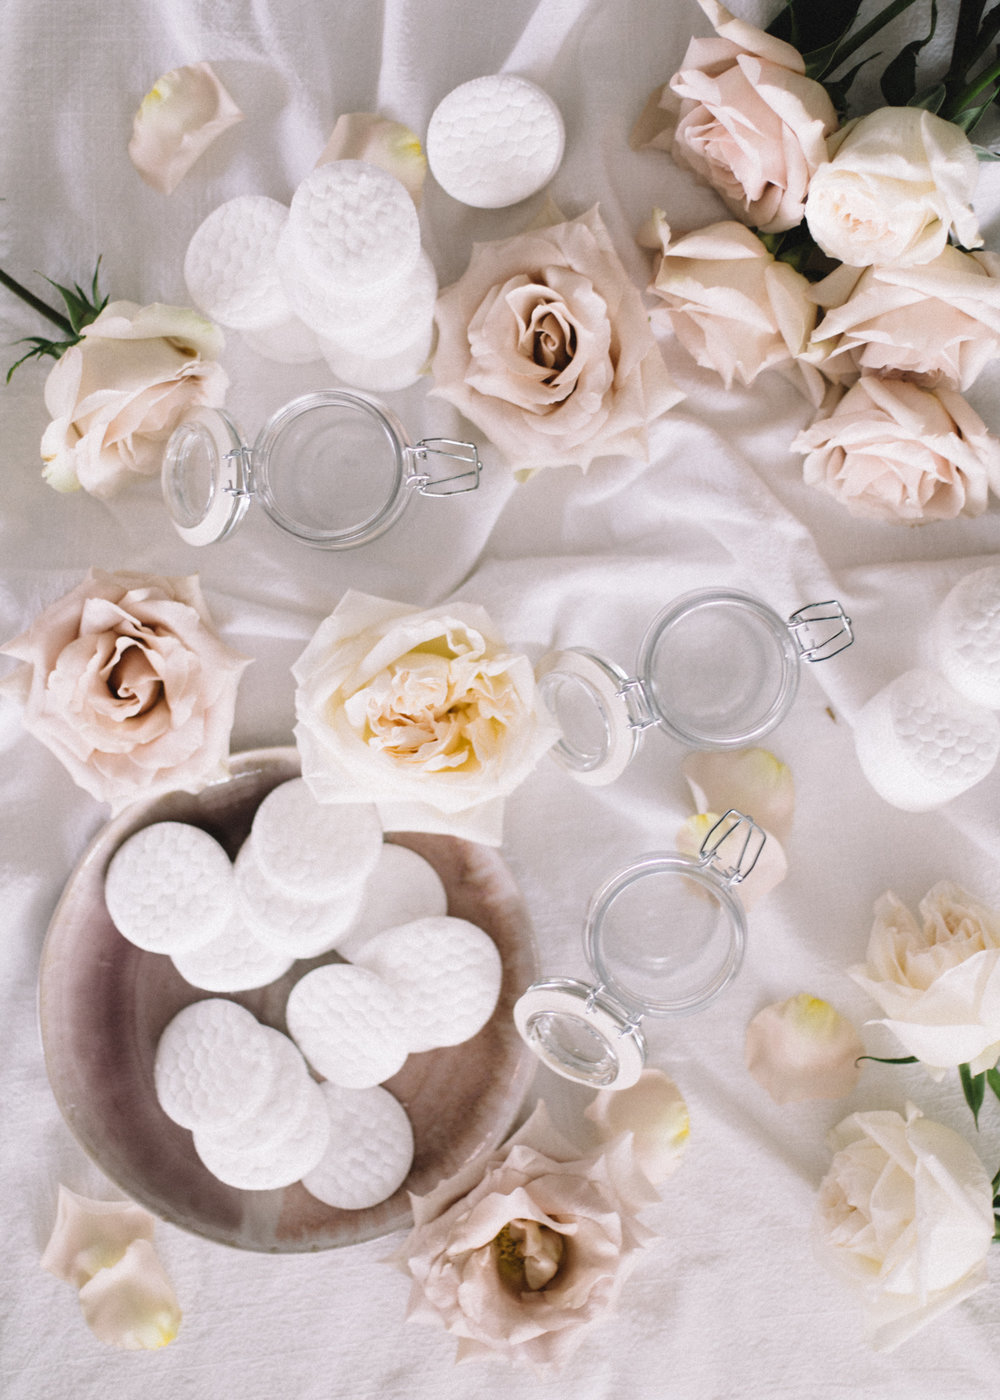 Rose Witch Hazel Beauty Pads | A Fabulous Fete